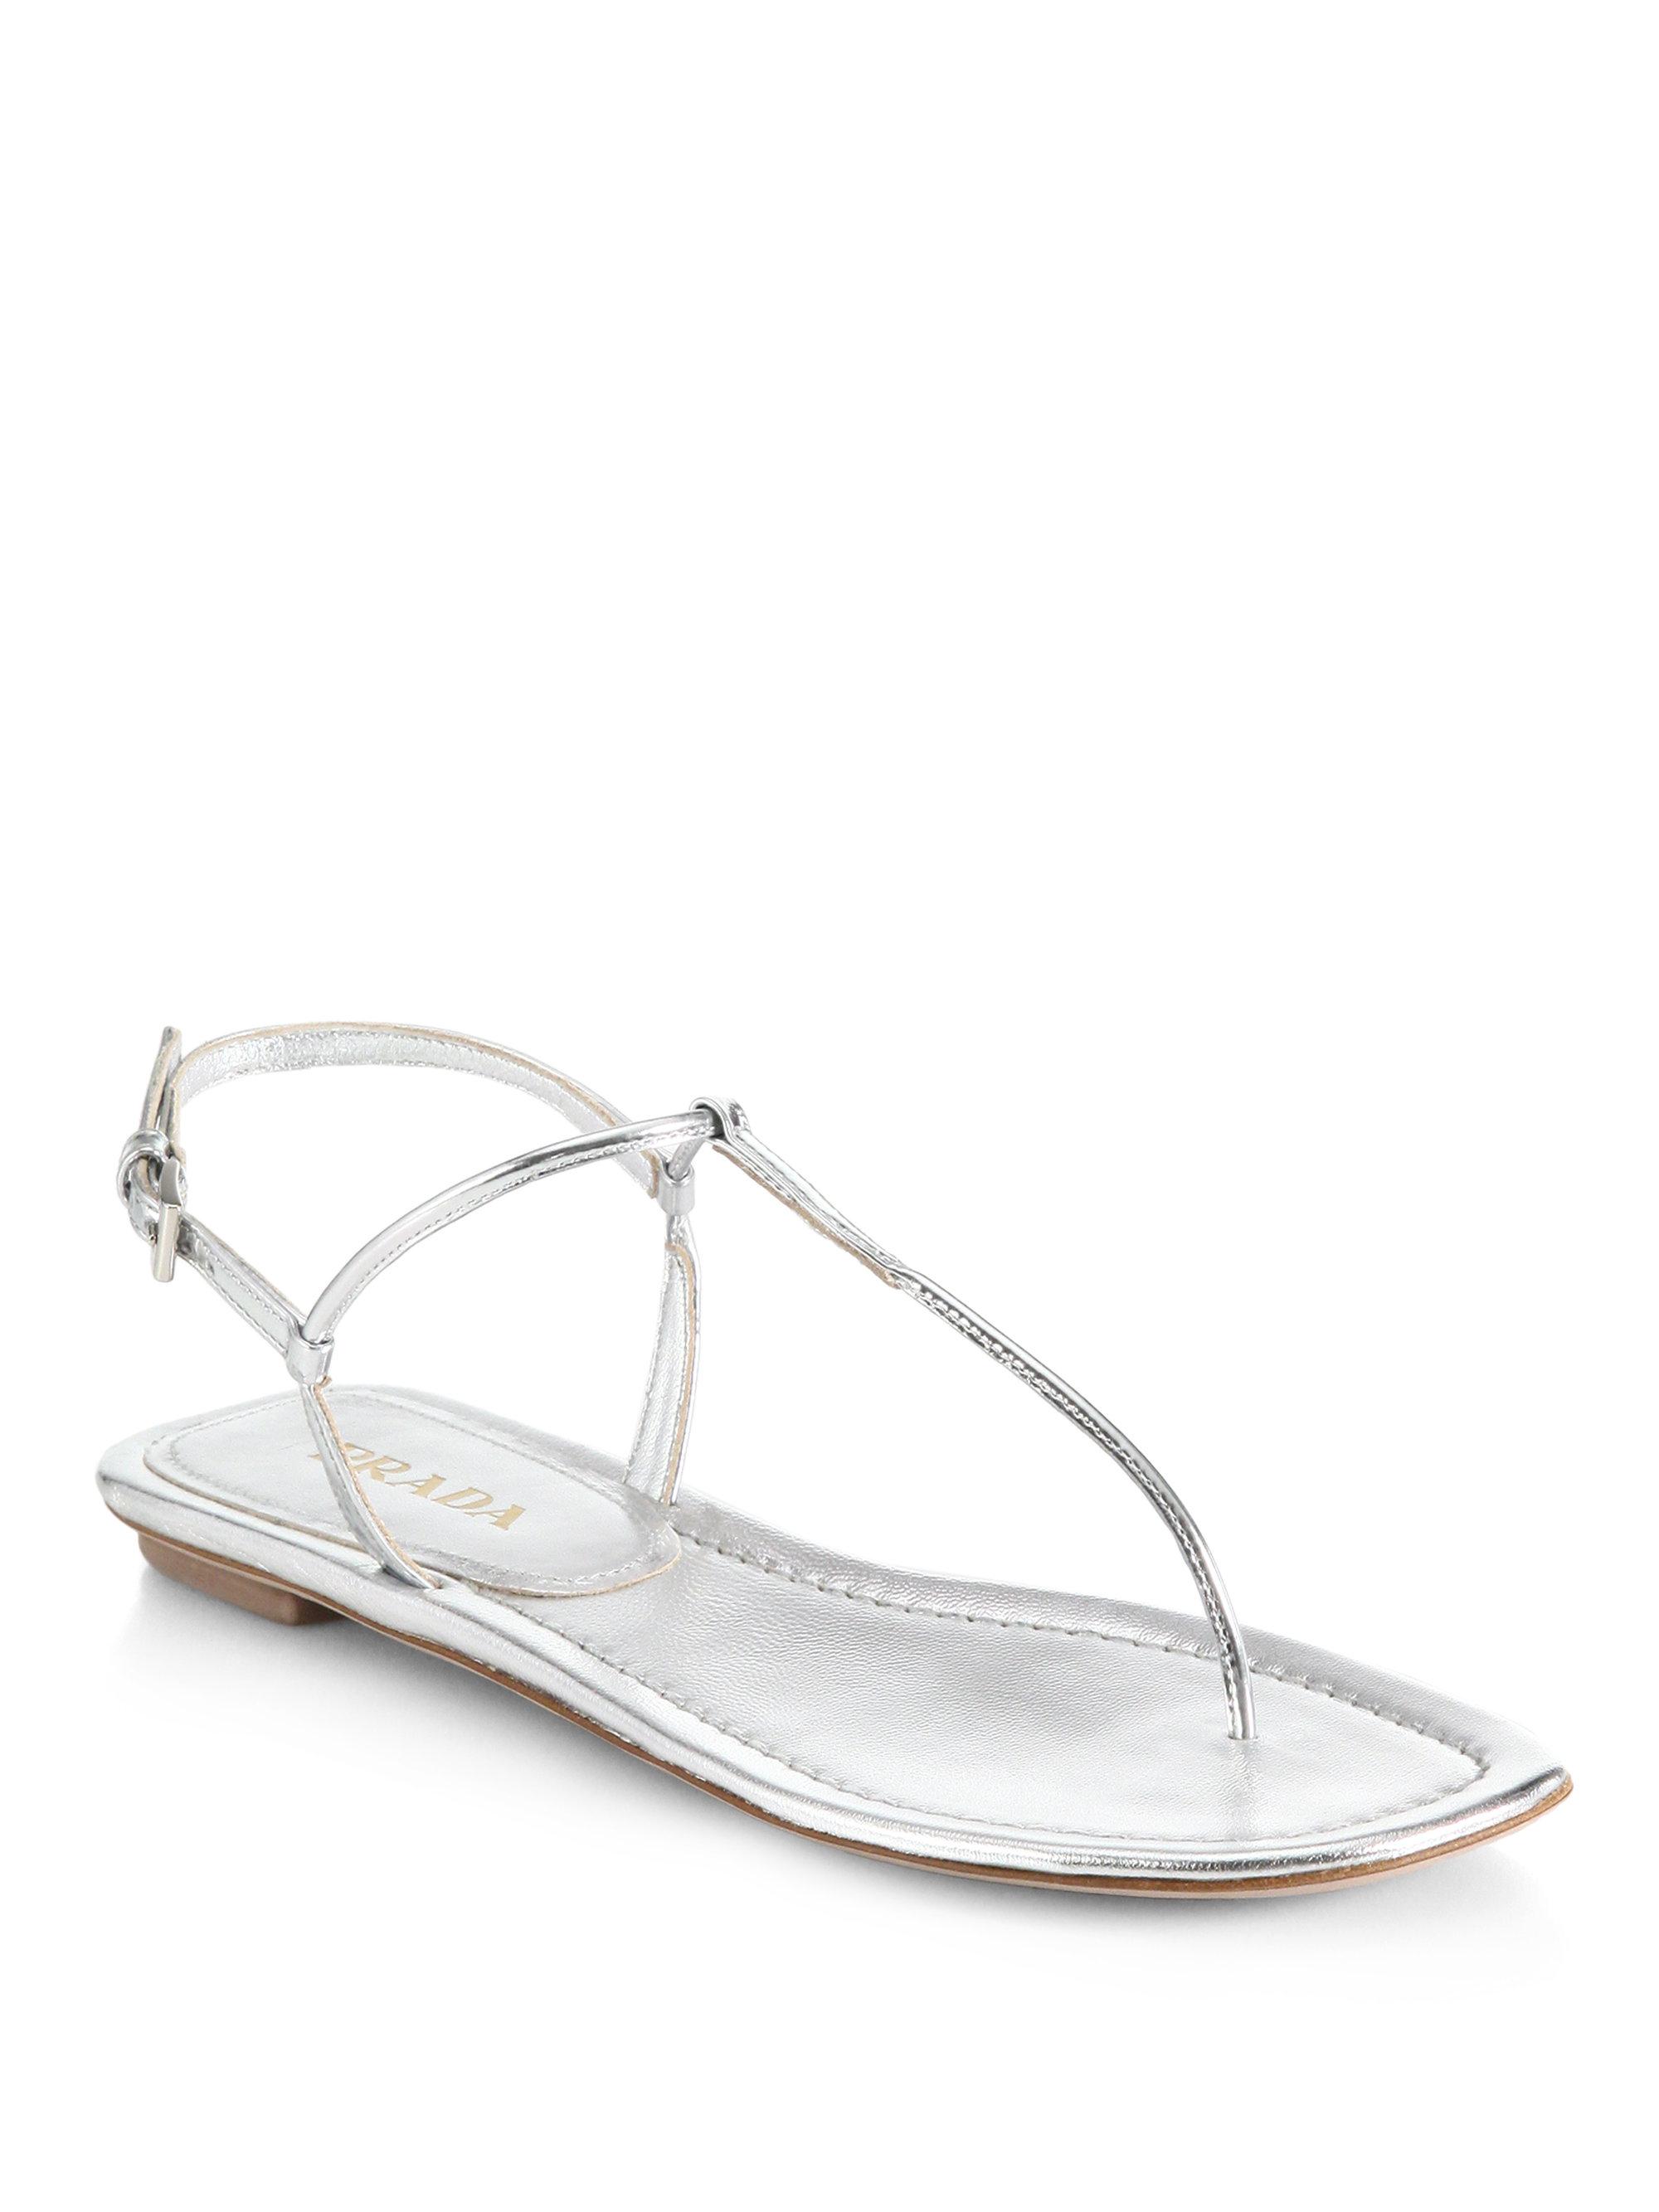 bab9e754014ade Lyst - Prada Metallic Leather Thong Sandals in Metallic